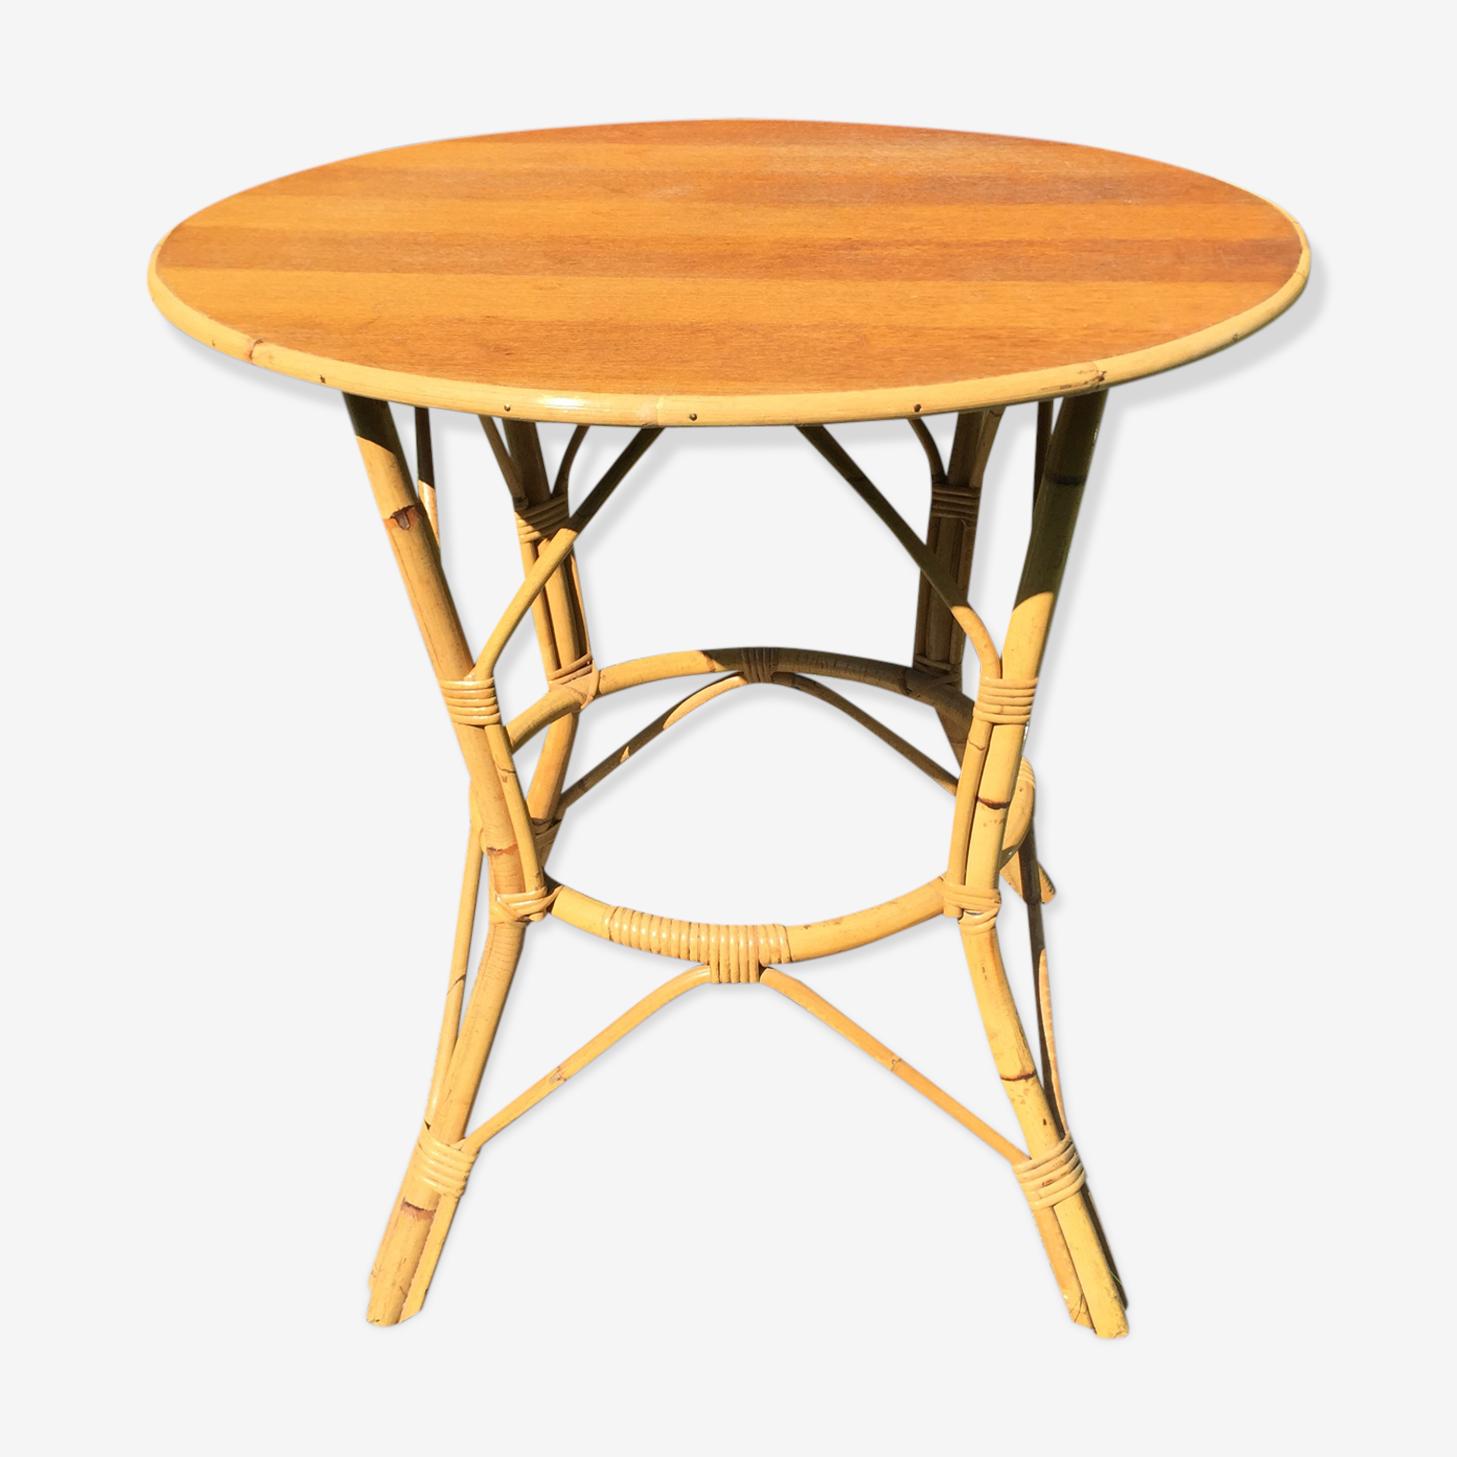 Table en bambou et rotin 1960 vintage